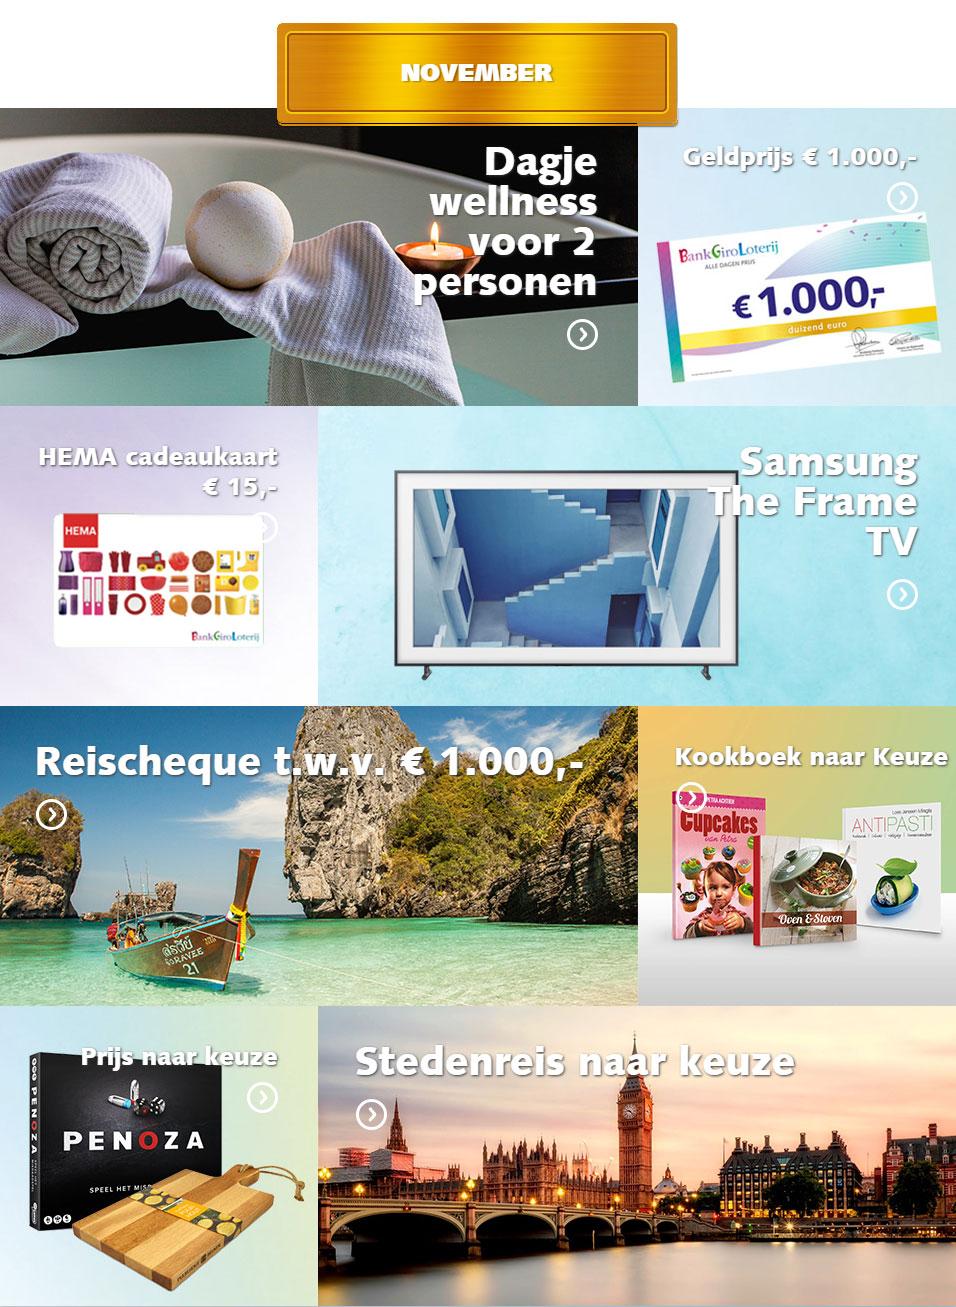 bankgiro loterij prijzen november 2018